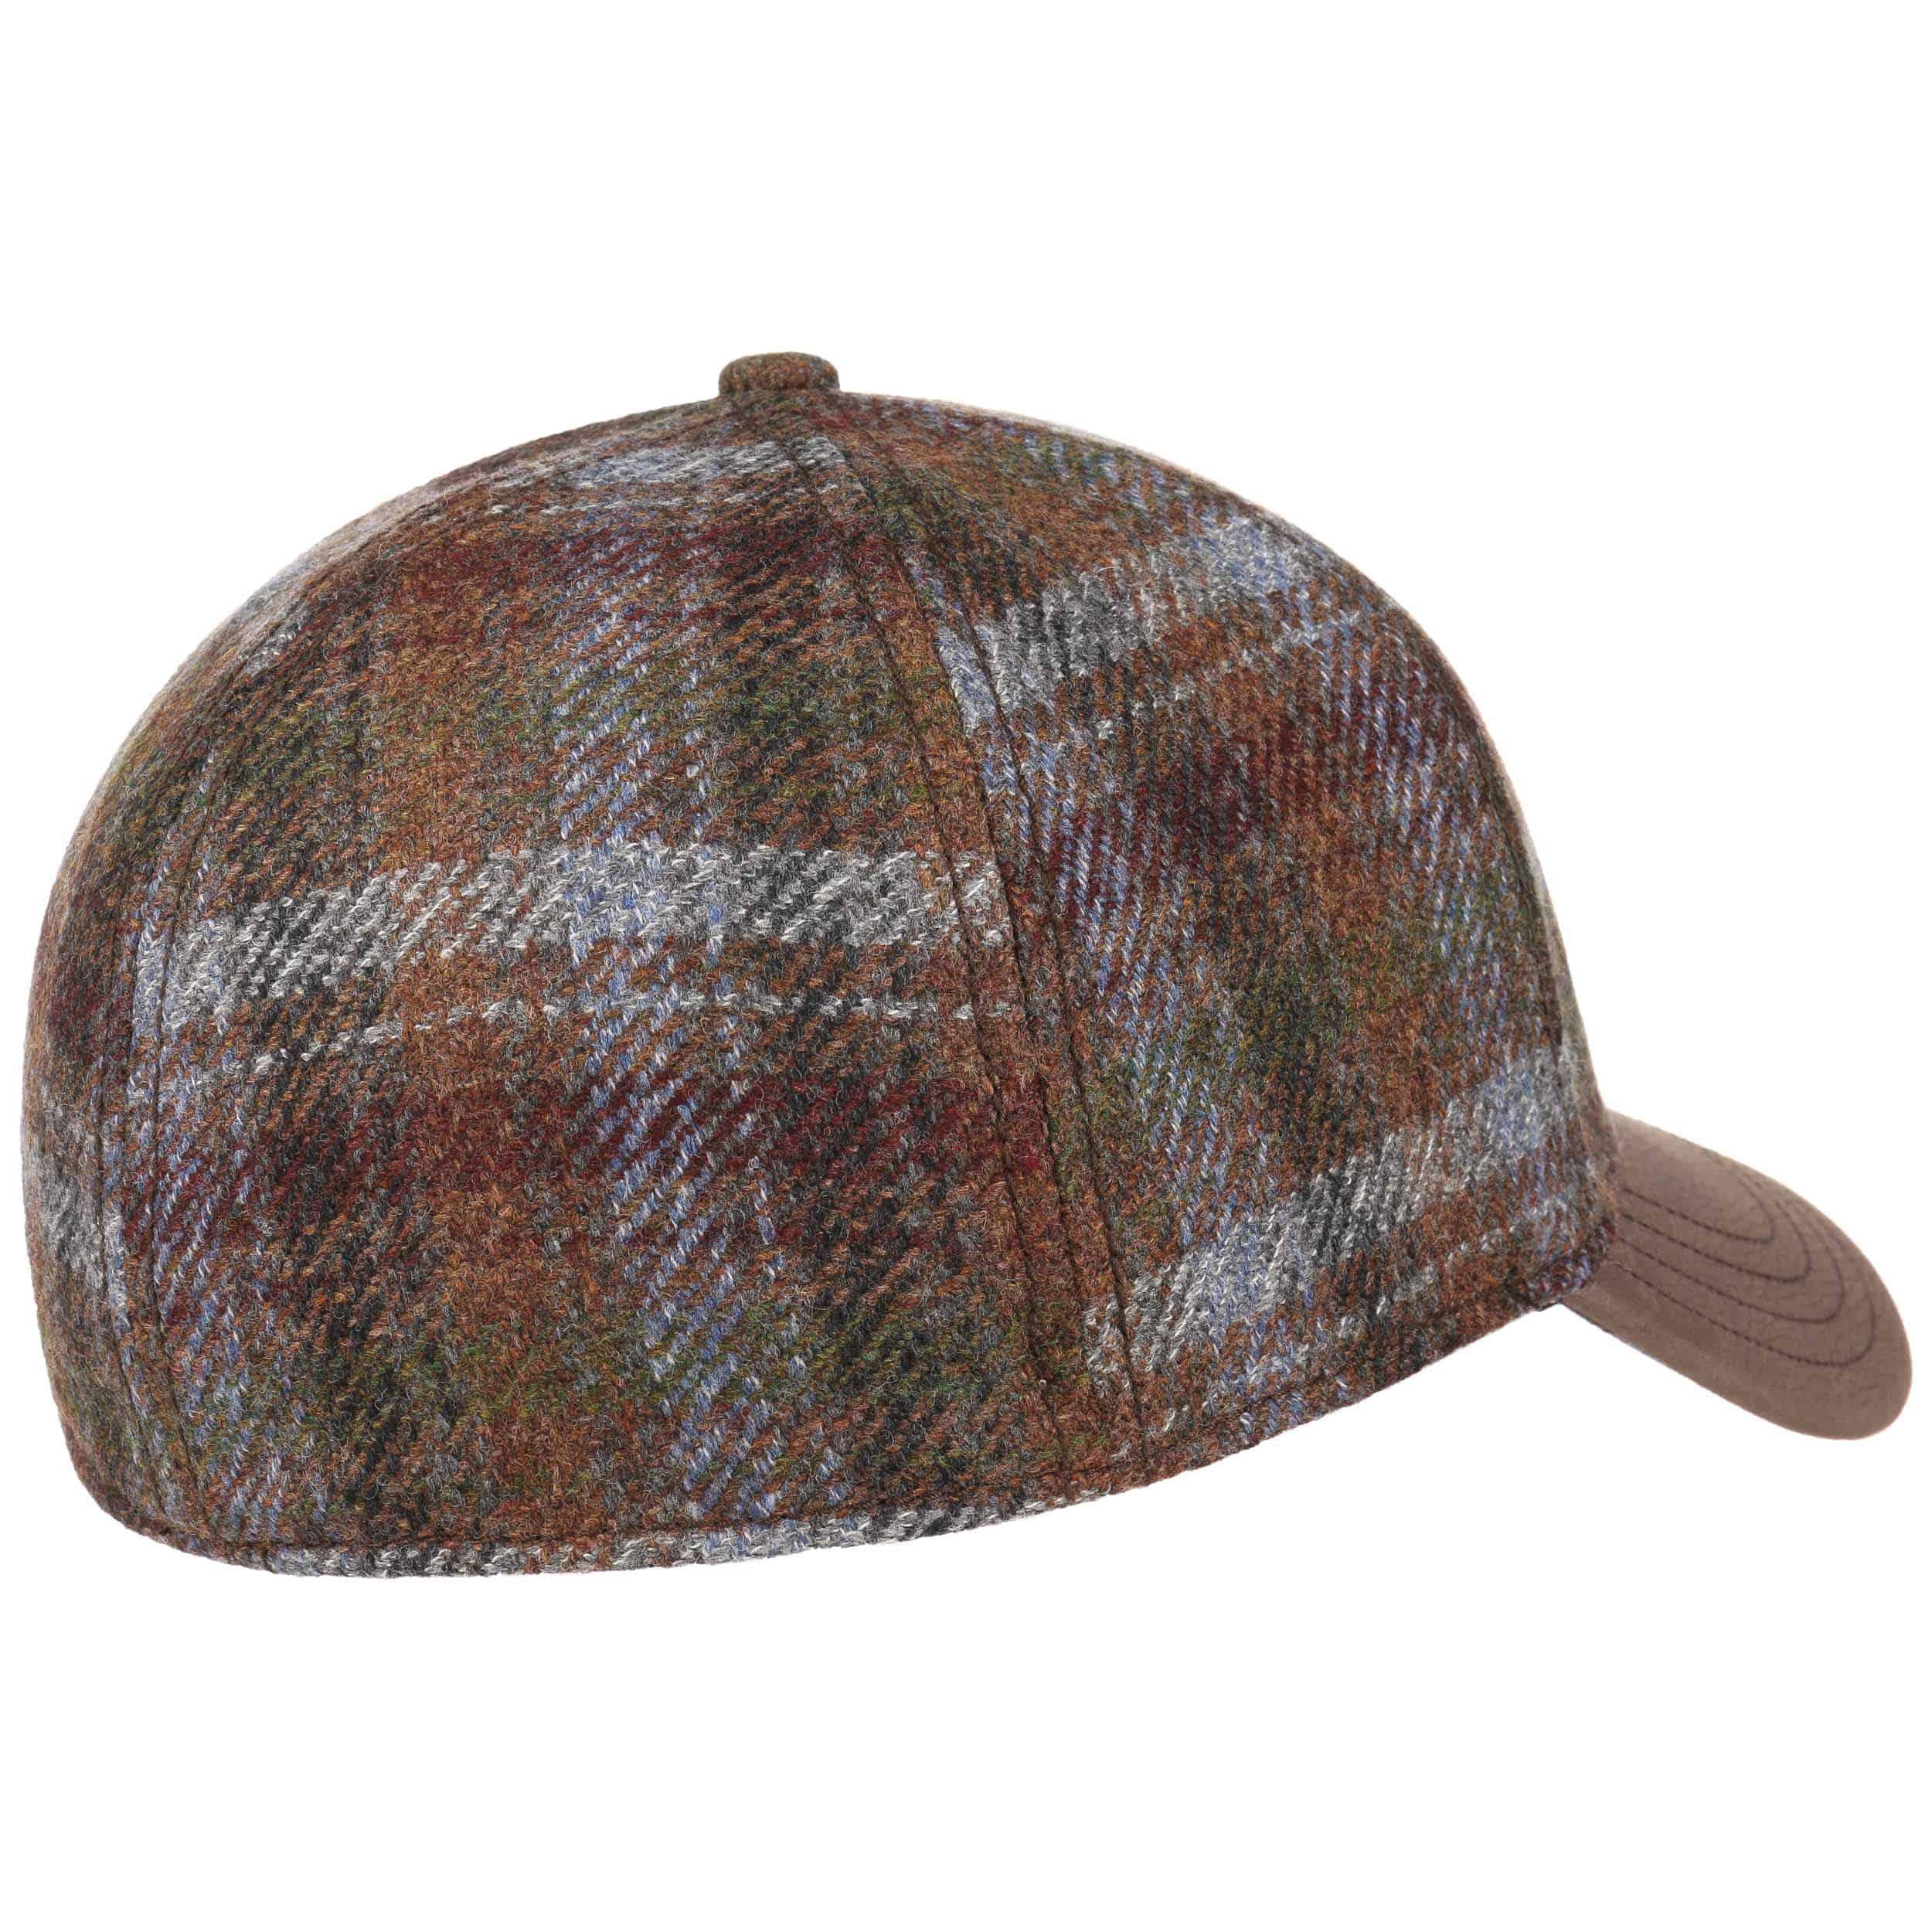 d6efabedcd0 ... Myler Wool Check Baseball Cap by Stetson - brown-grey 3 ...